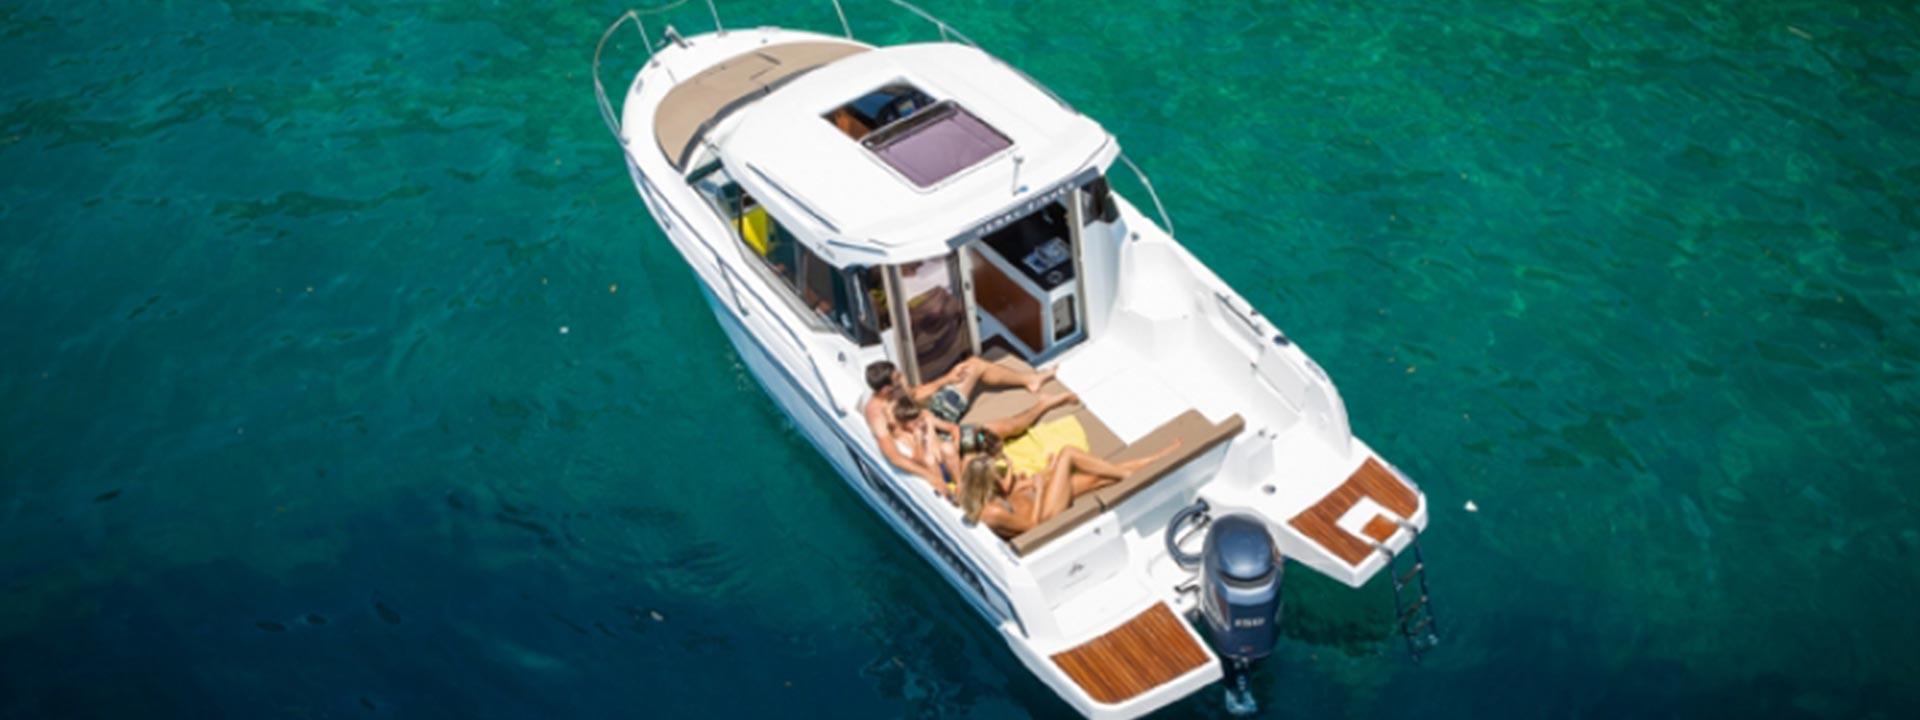 mayer-charter-boat-header-jeanneau-merry-fisher-795-08